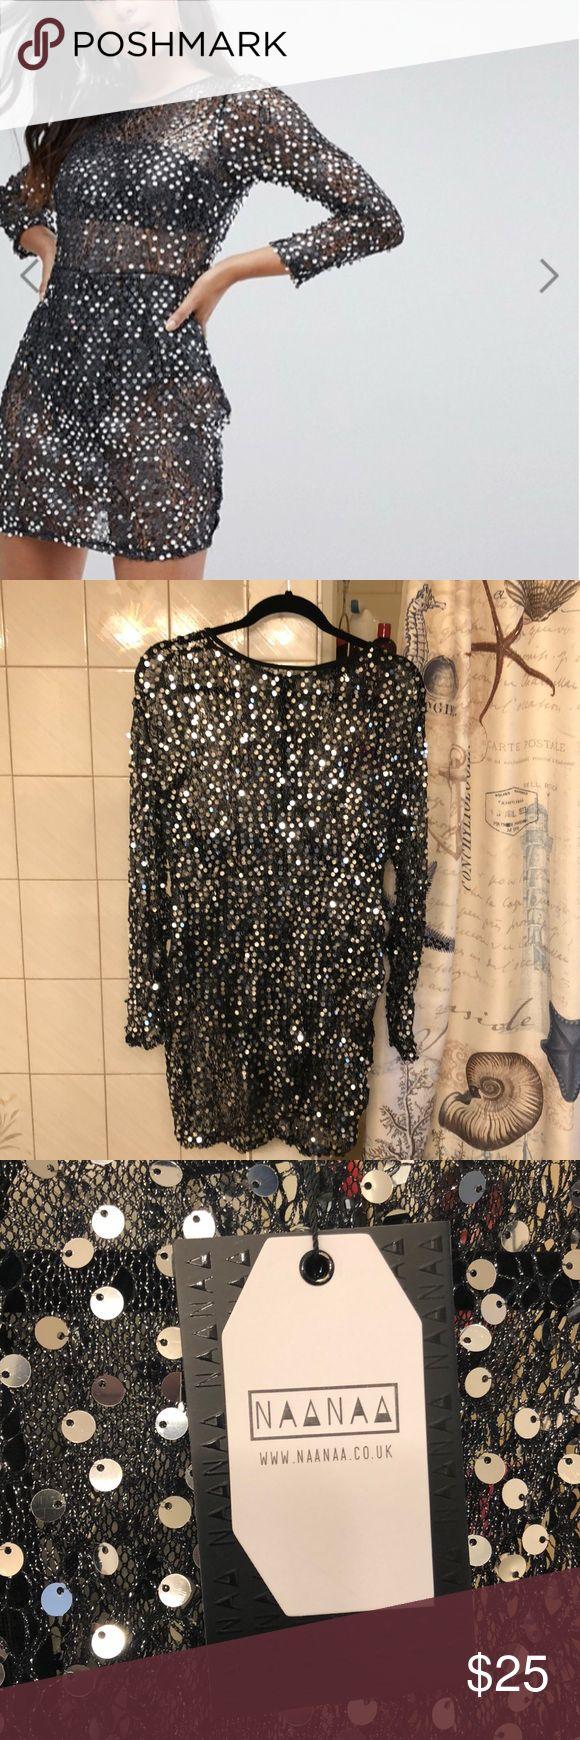 ASOS Sequin Dress w Satin Underlay Sexy, sequin sheer dress with satin underlay. Size 10. New with tags- didn't fit me 😔 Retail: $78 ASOS Dresses